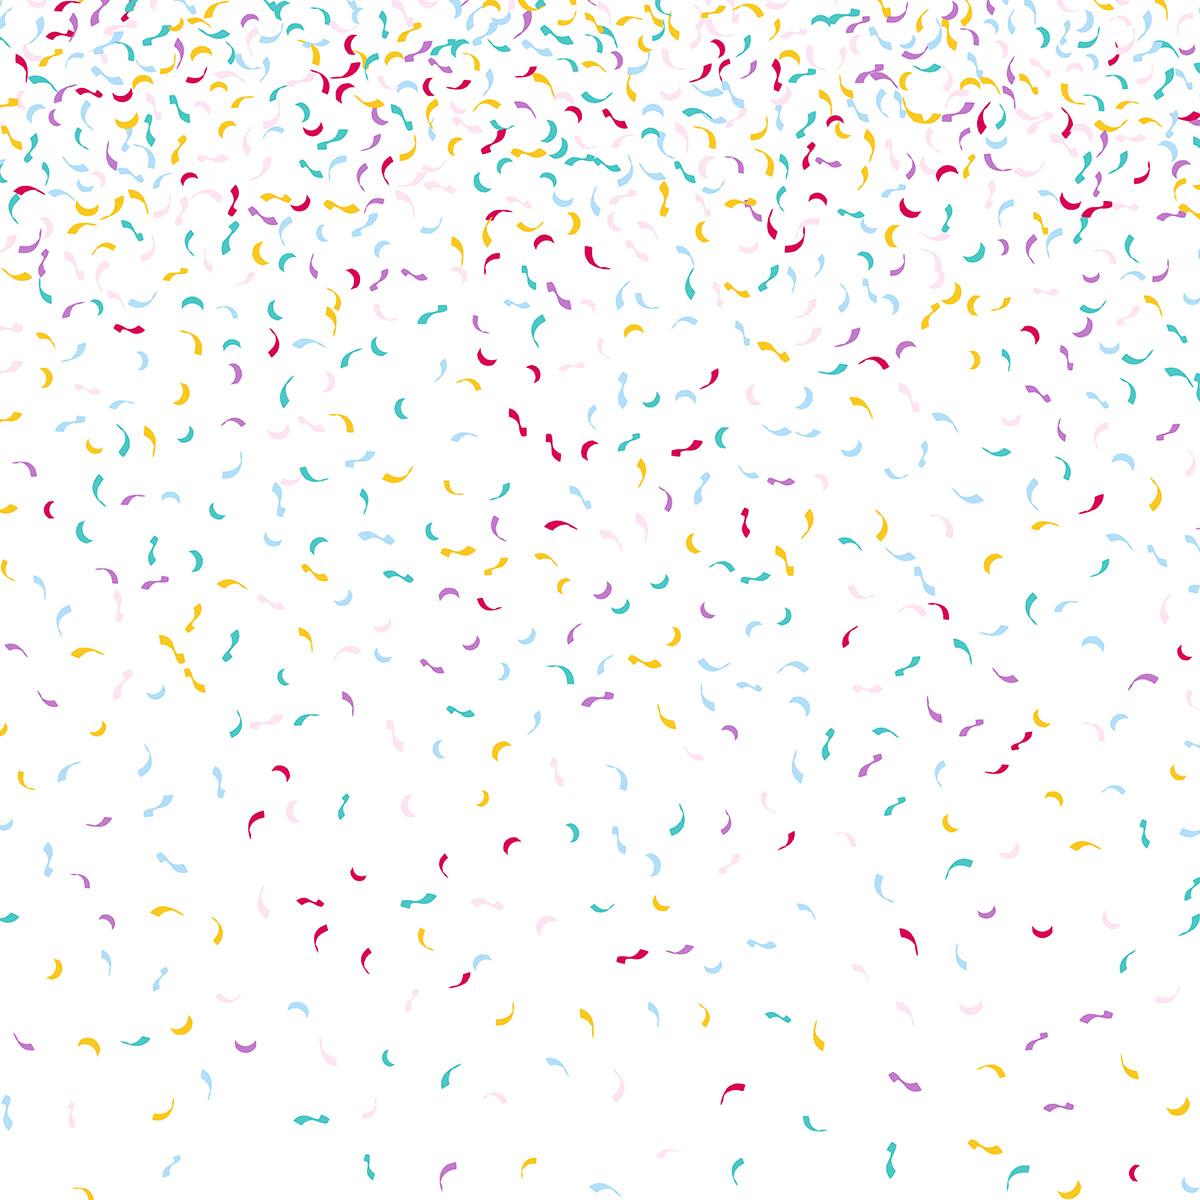 Confetti Background Download Free Vector Art Stock